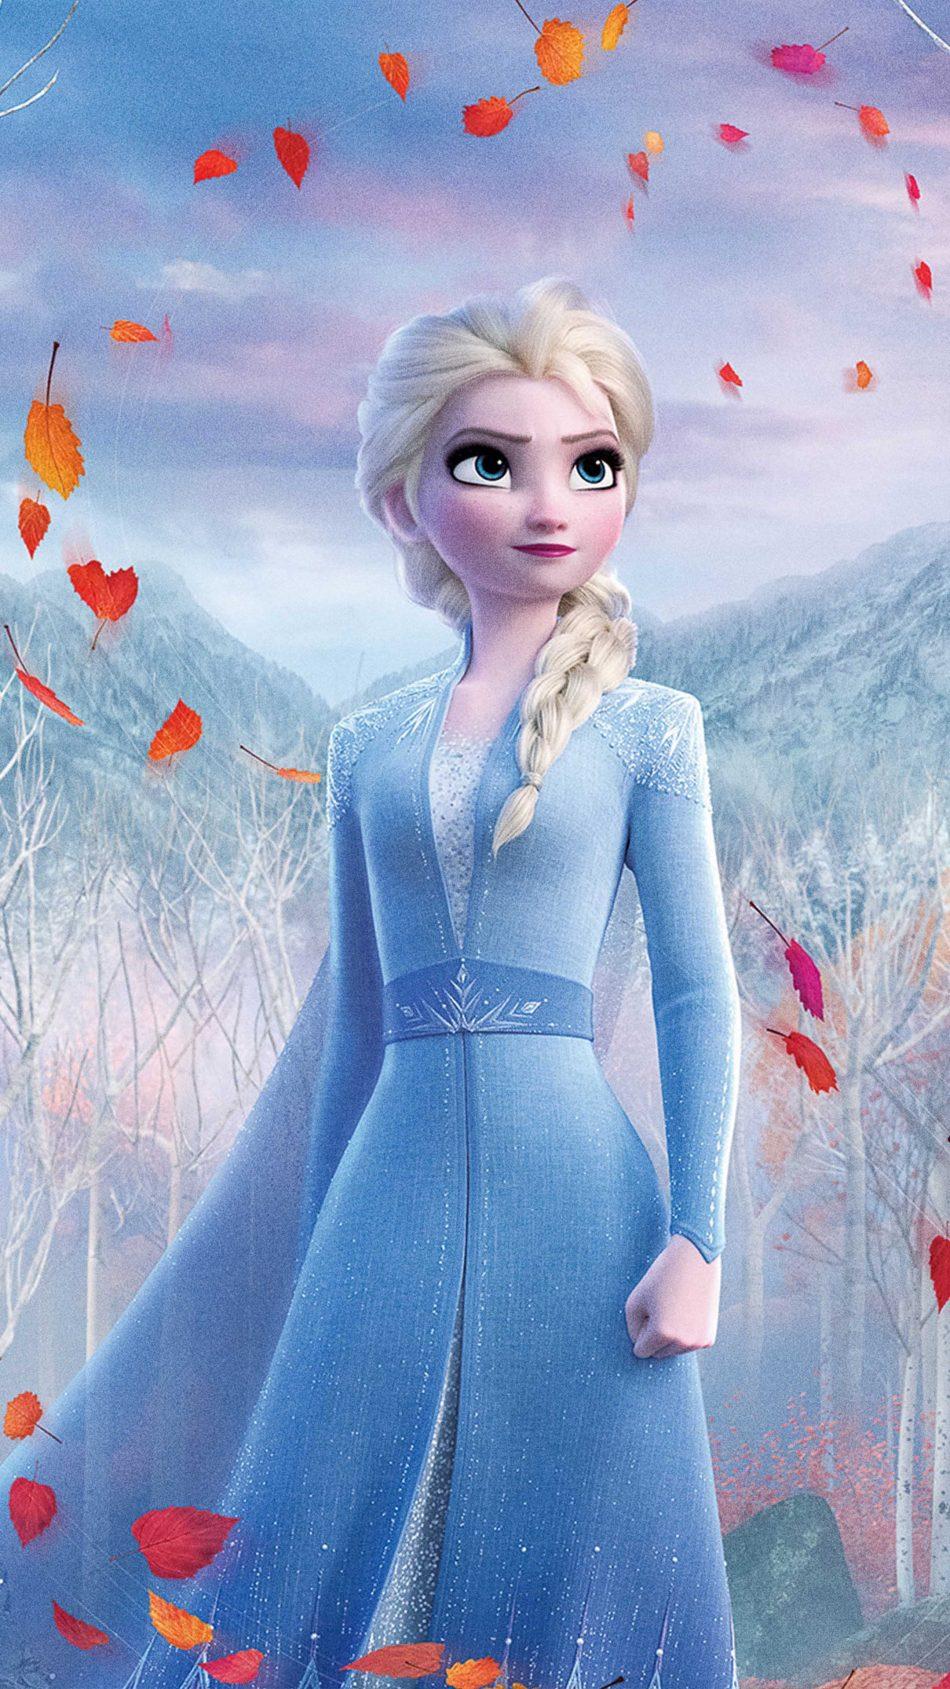 Queen Elsa In Frozen 2 Walt Disney Animation 2019 4K Ultra ...